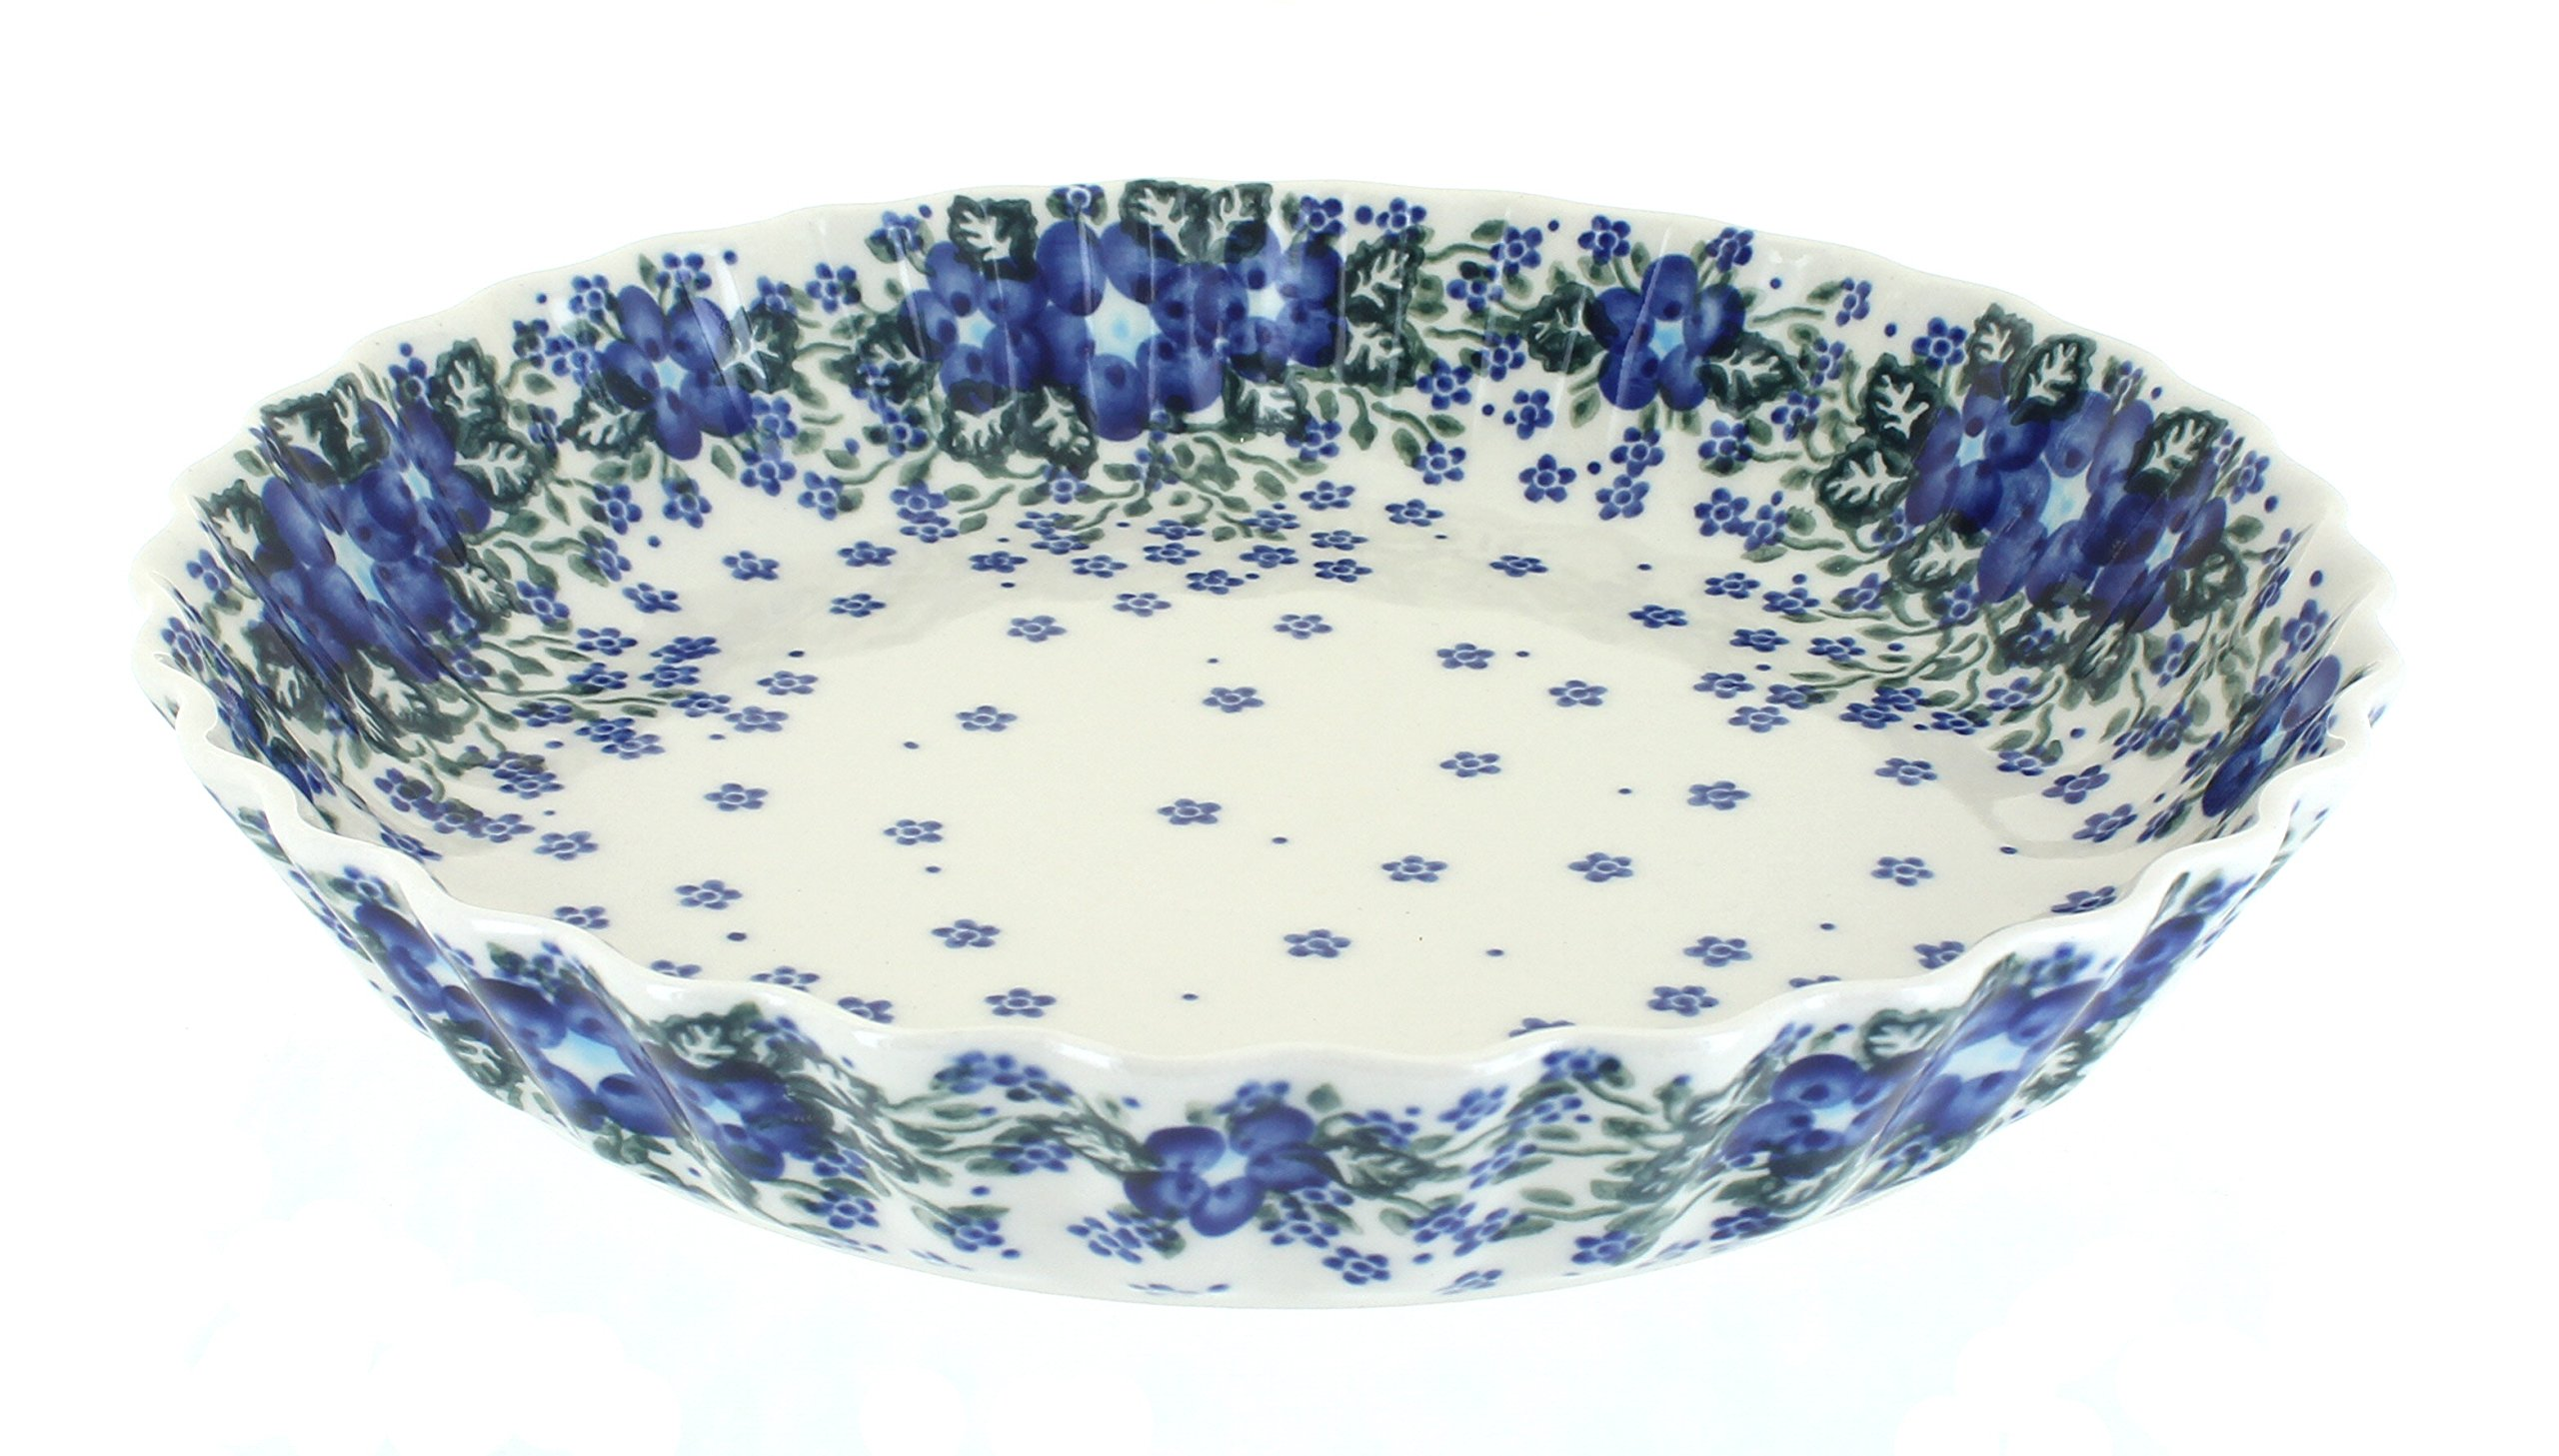 Blue Rose Polish Pottery Melanie Pie Plate by Blue Rose Pottery